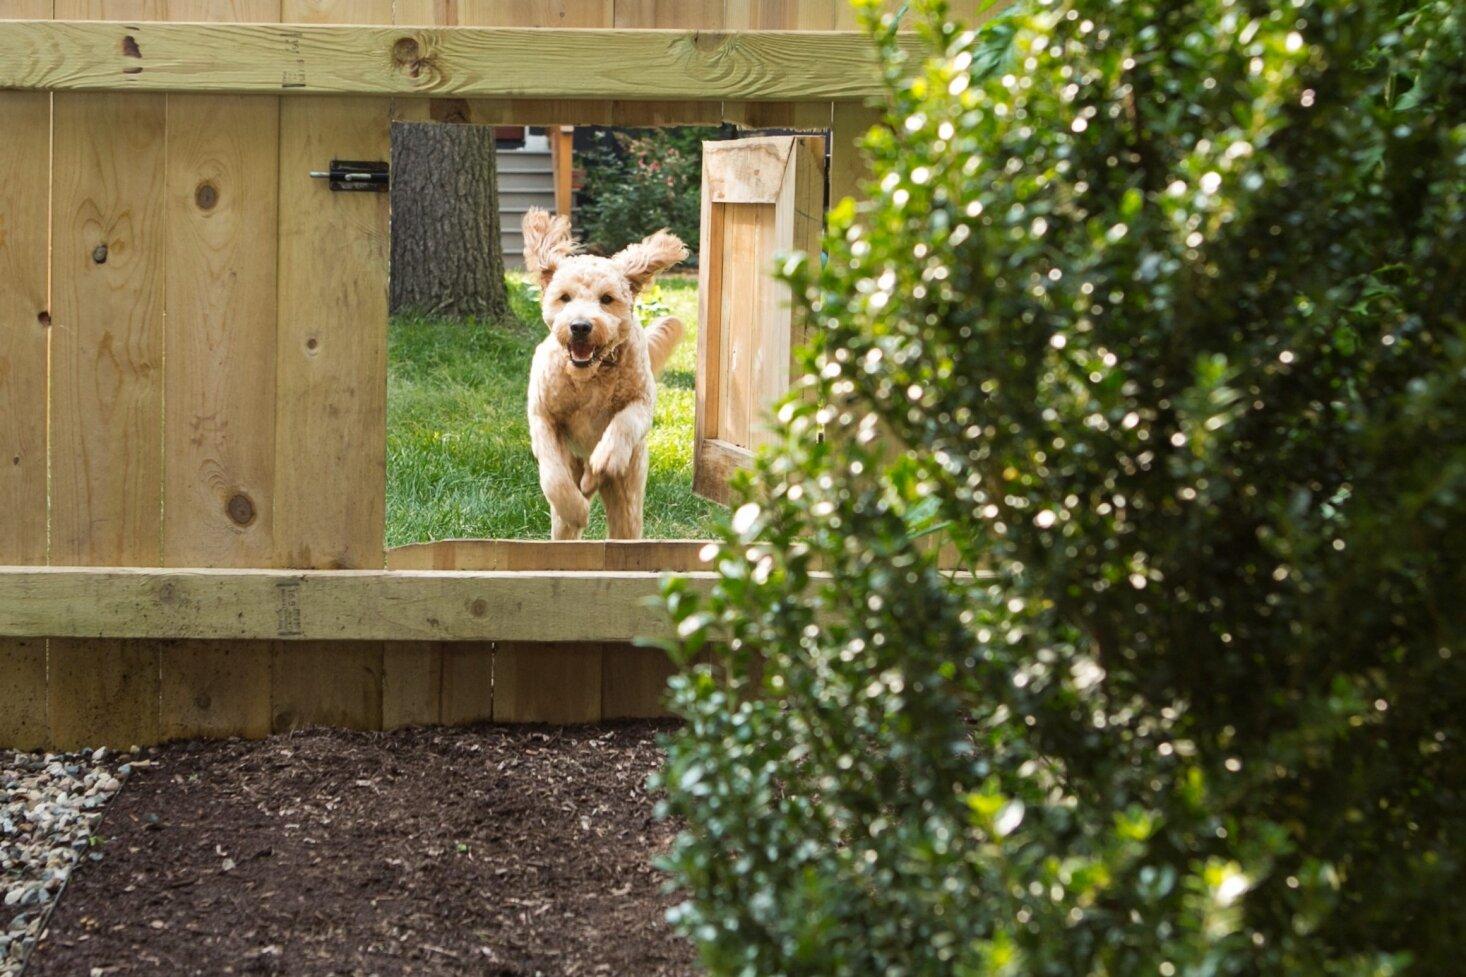 dog-door-fence-ann-arbor-michelle-adams-by-marta-xochilt-perez-1466x977.jpg